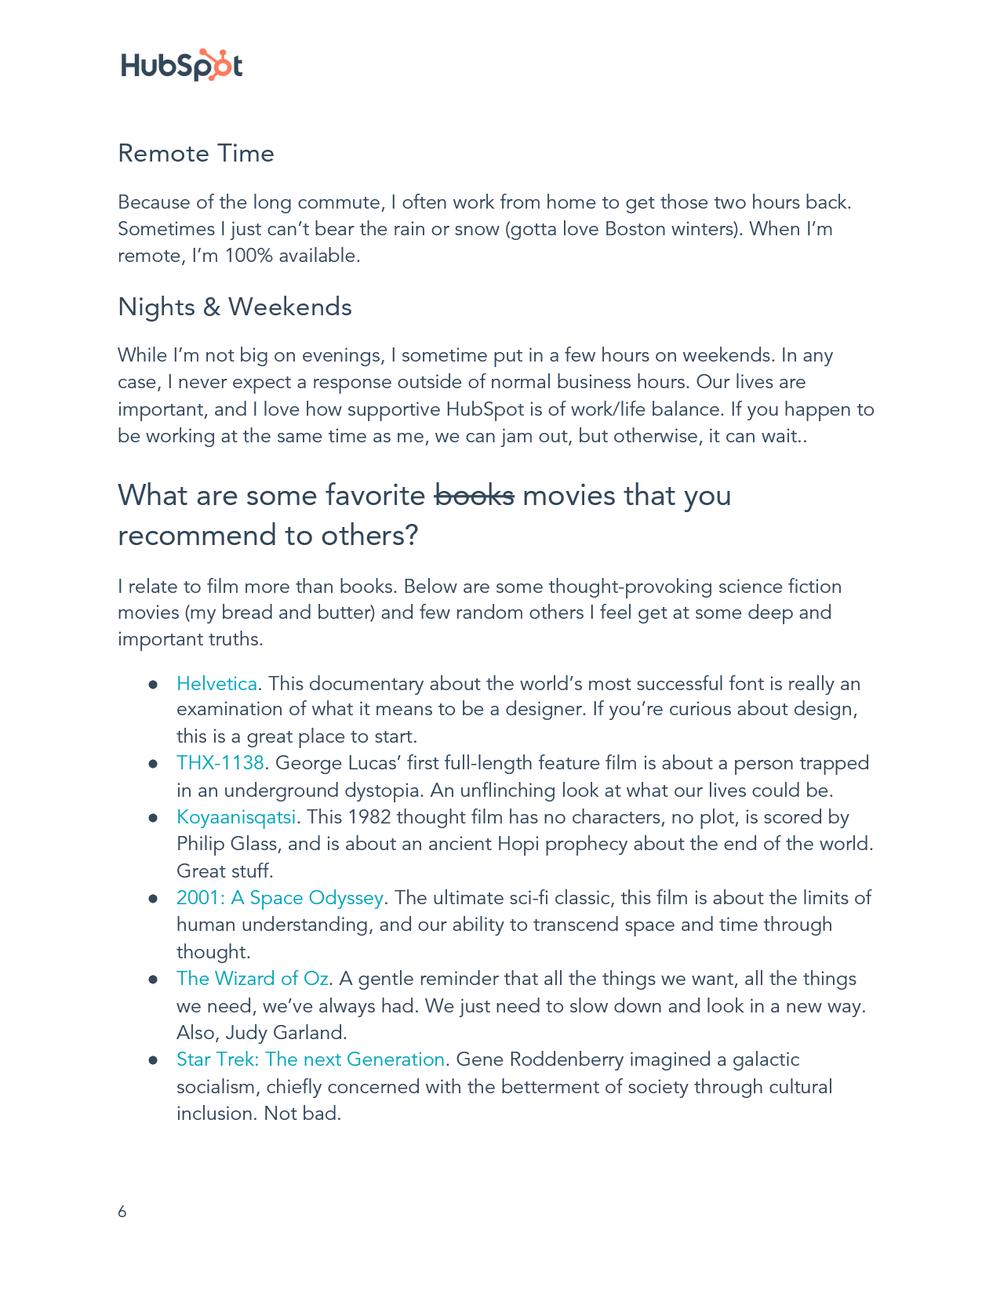 Ben Spear _ Marketing Team User Guide-6.png